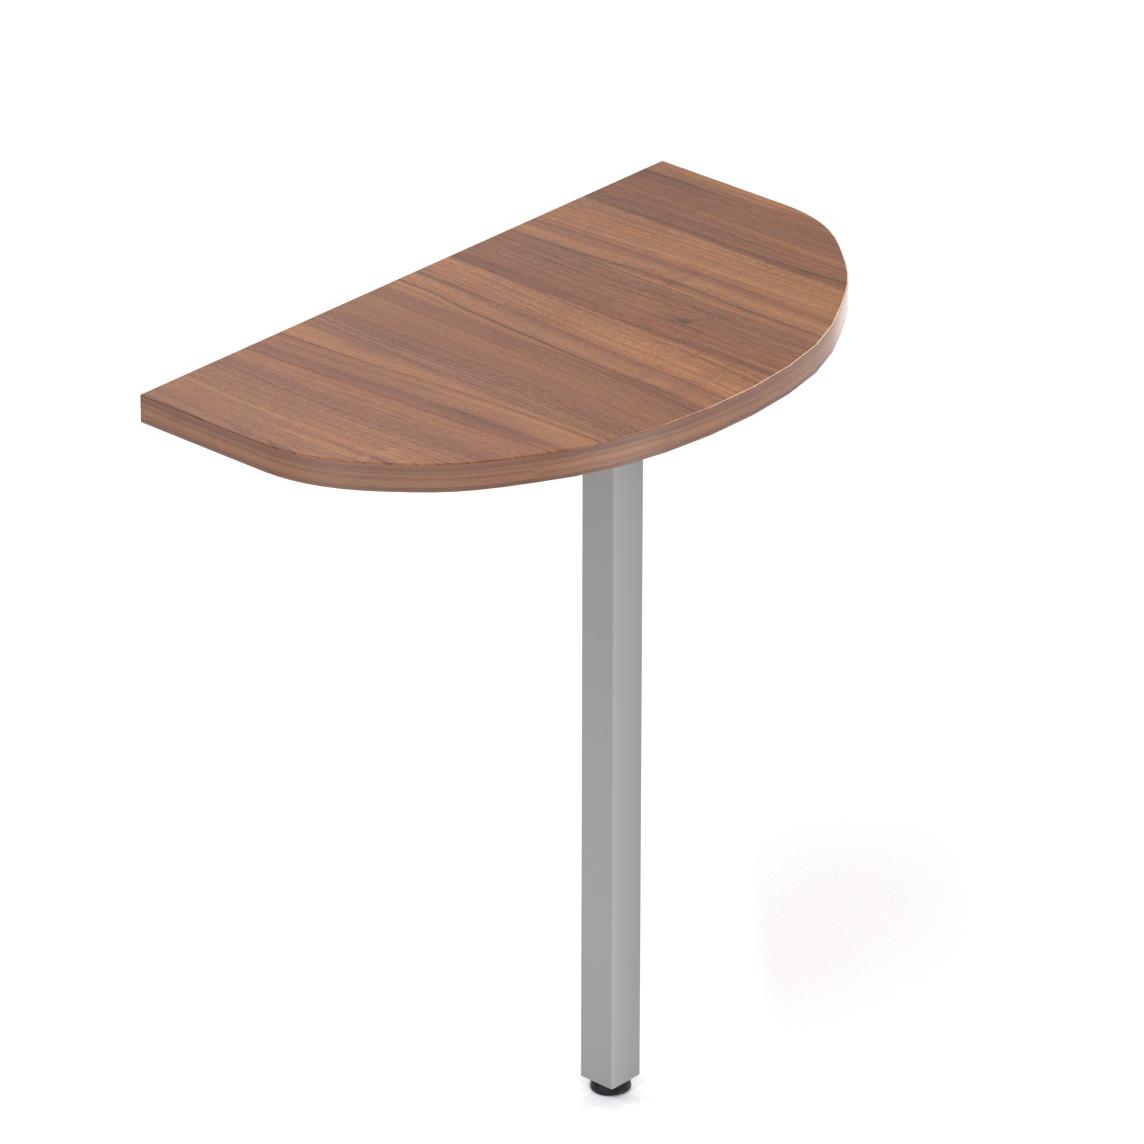 Prístavný stôl Komfort 70x40 cm - PR70 19